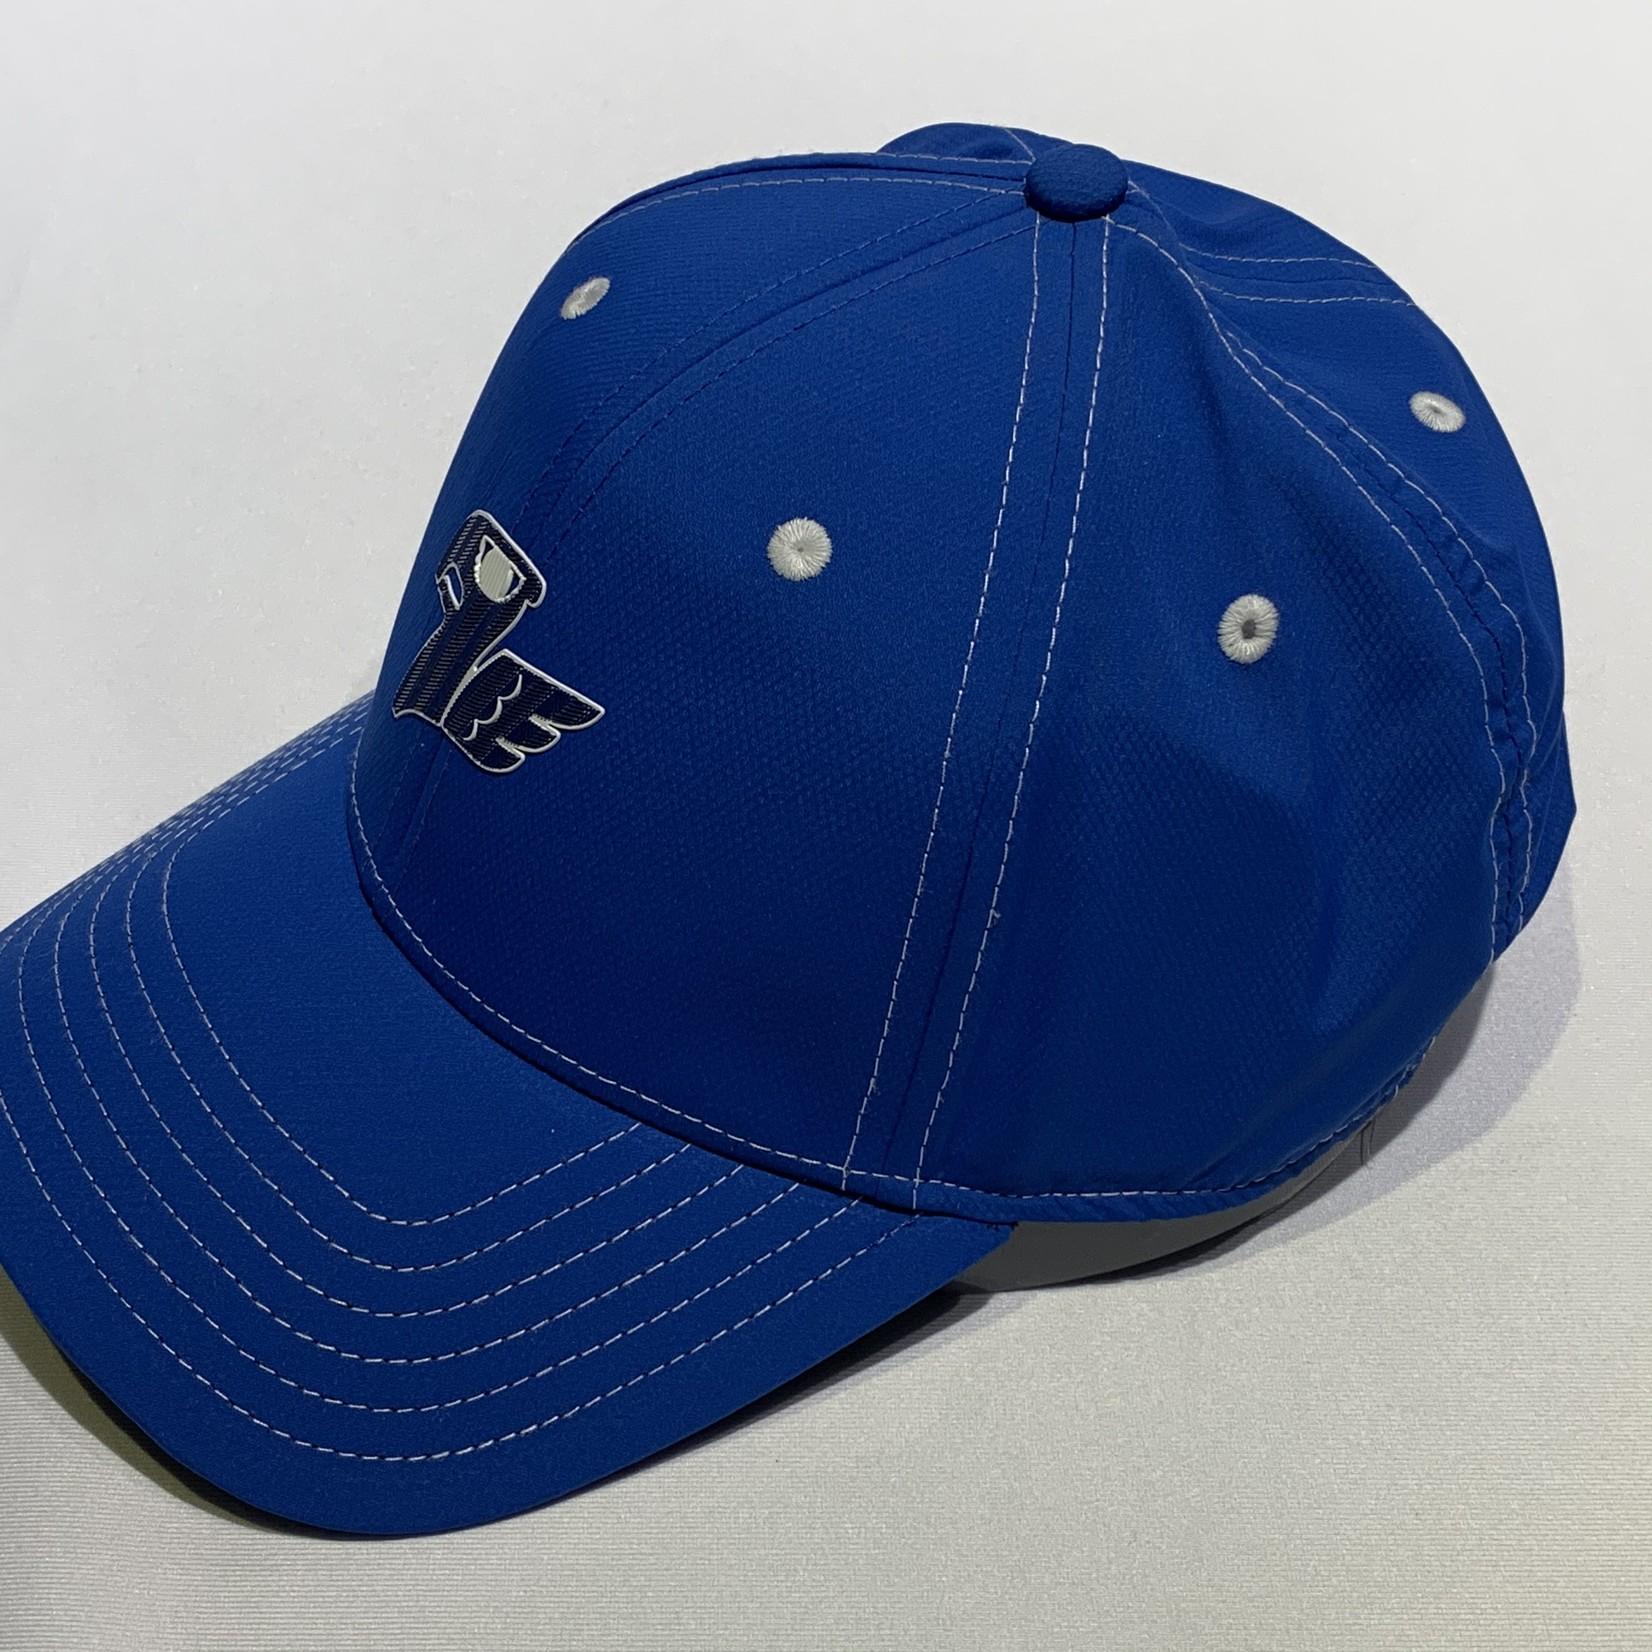 Prodigy Colton Hat - UGC Logo